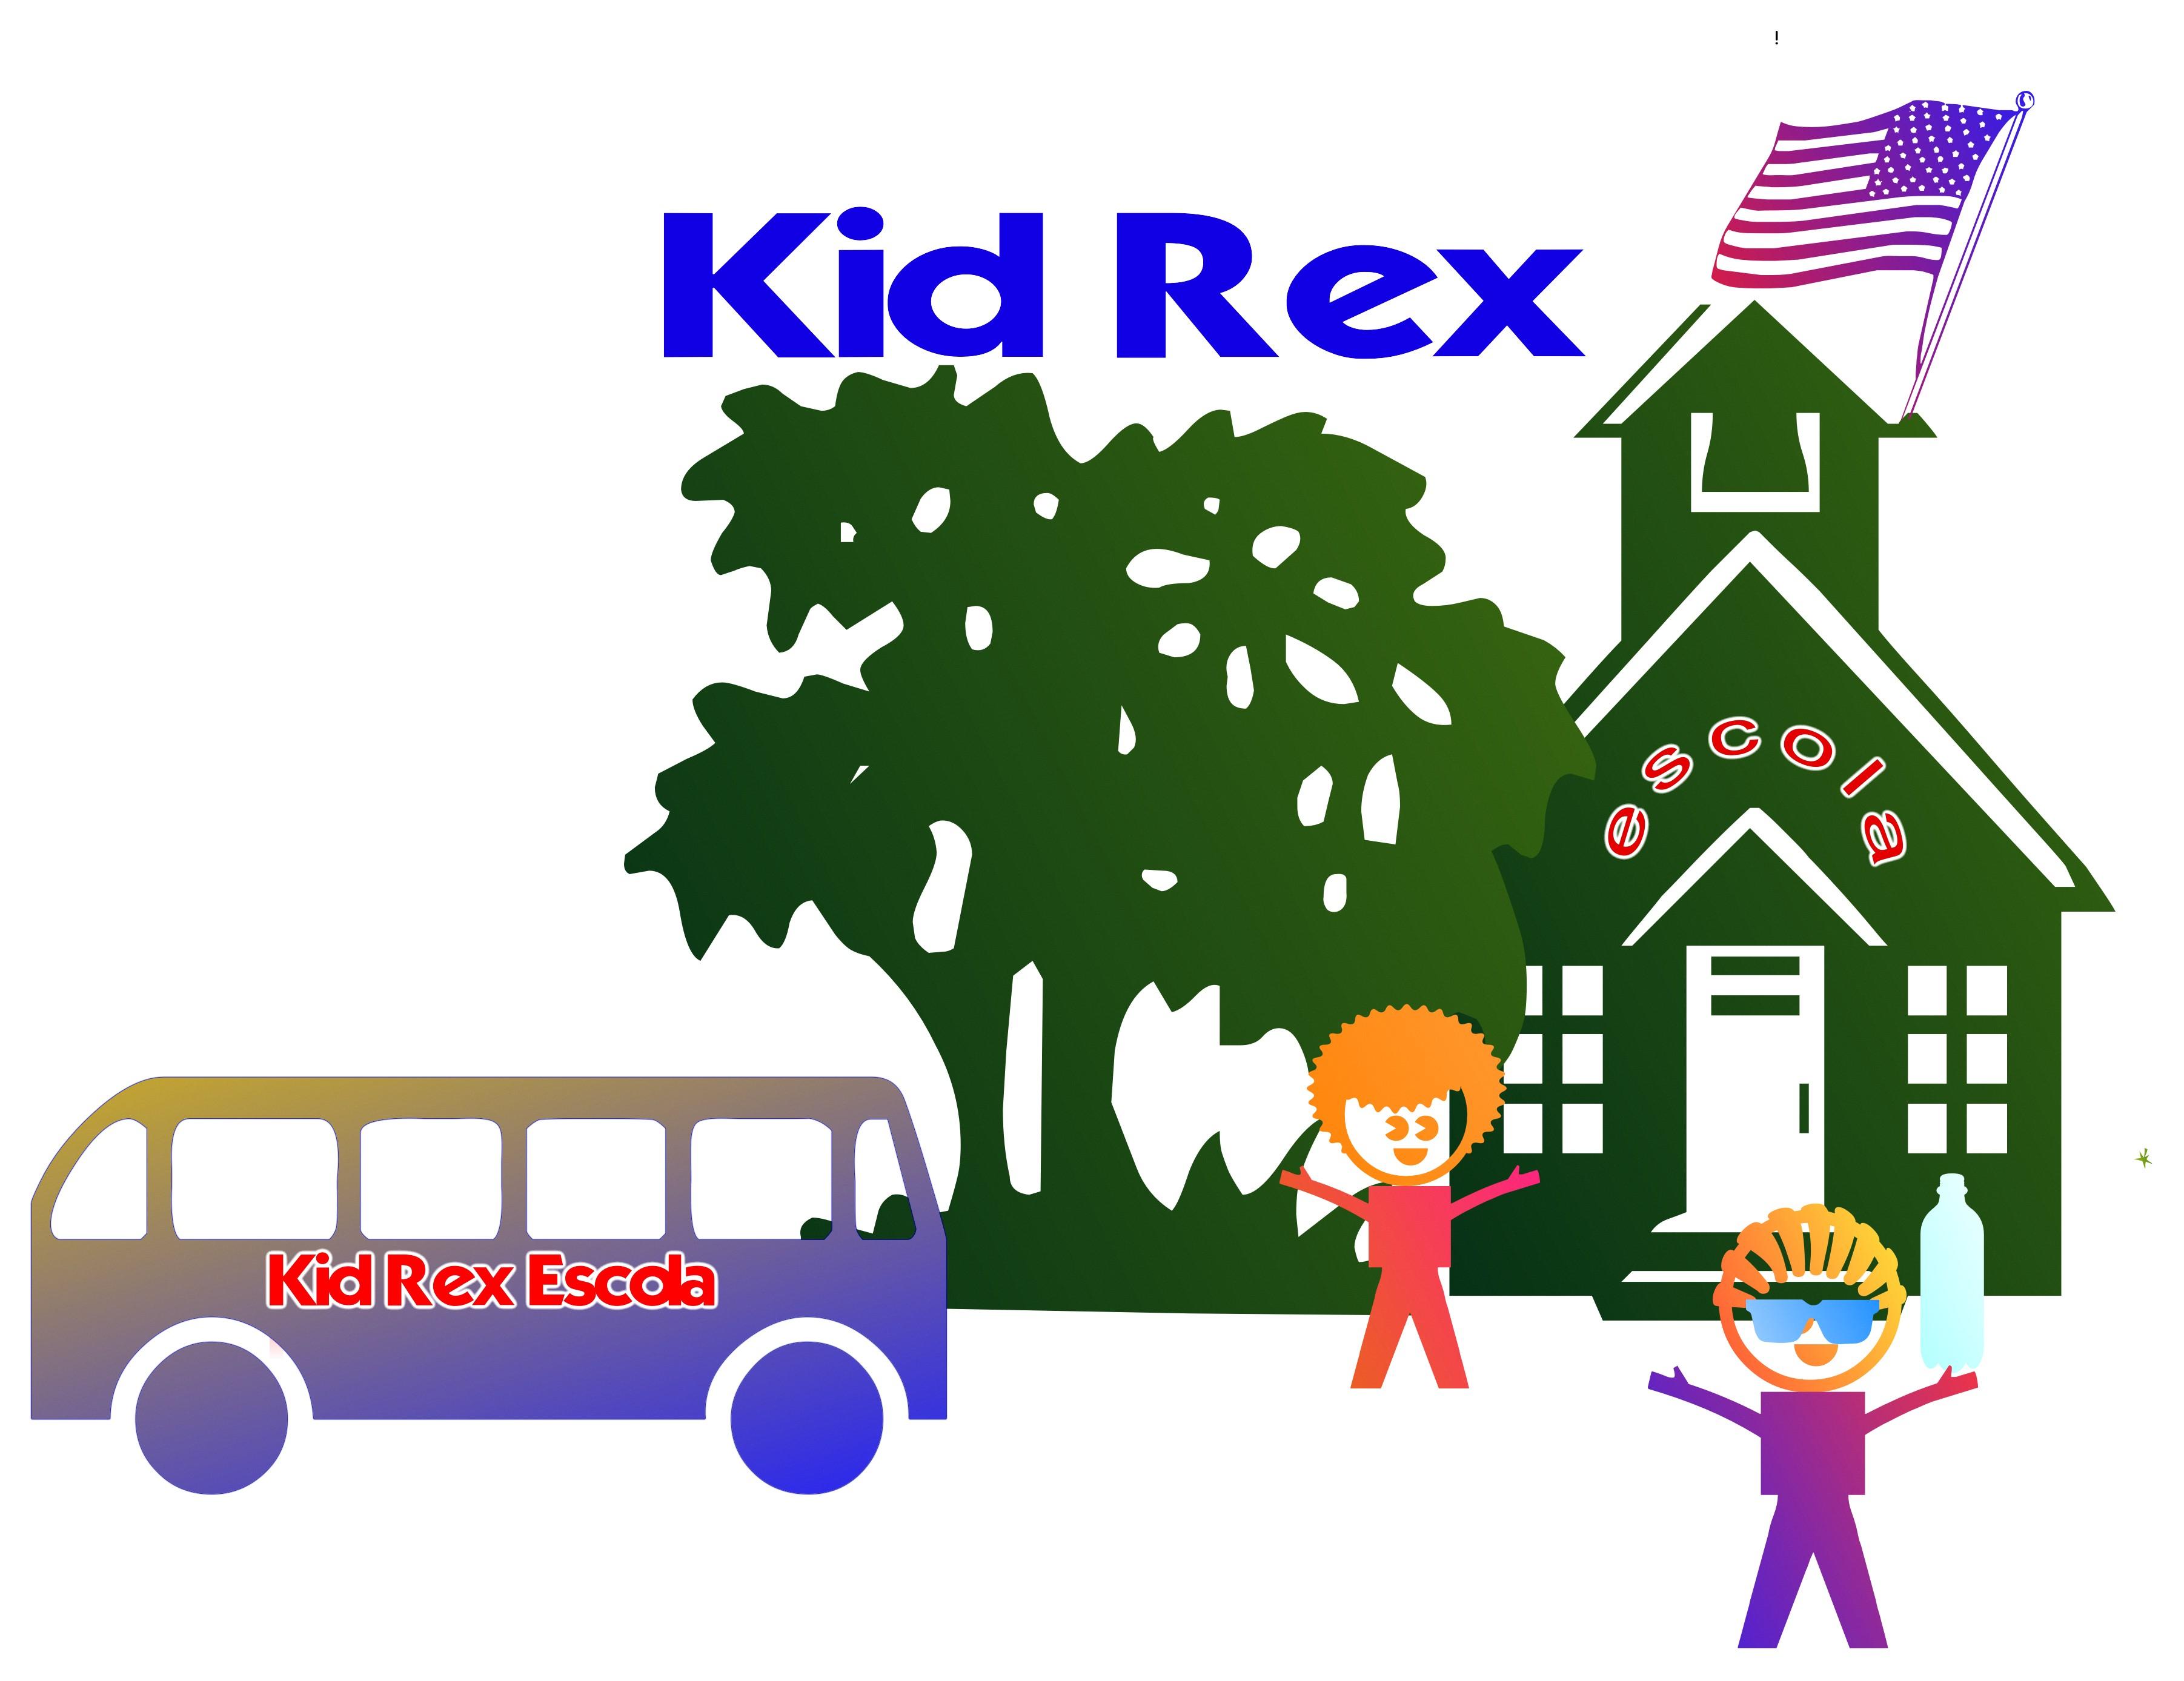 Www kidrex org susu work